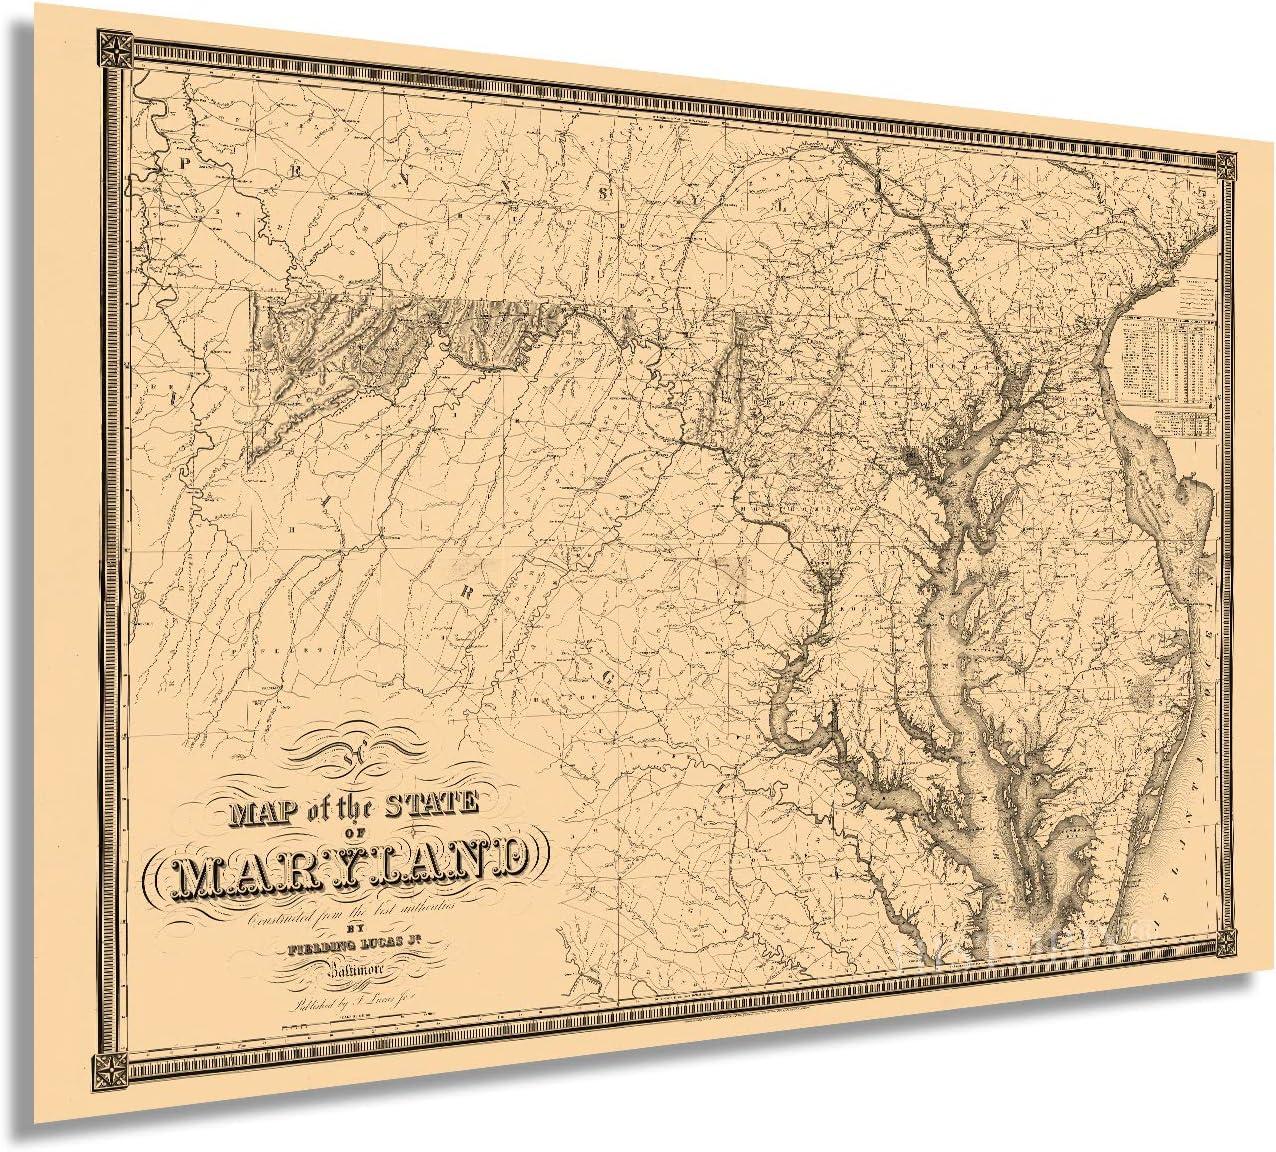 Historix Vintage 1841 Maryland State Map - 24x36 Inch Vintage Map of the State of Maryland Wall Art - Vintage Maryland Home Decor Poster Print - Showing Virginia Washington DC Chesapeake Bay (2 Sizes)